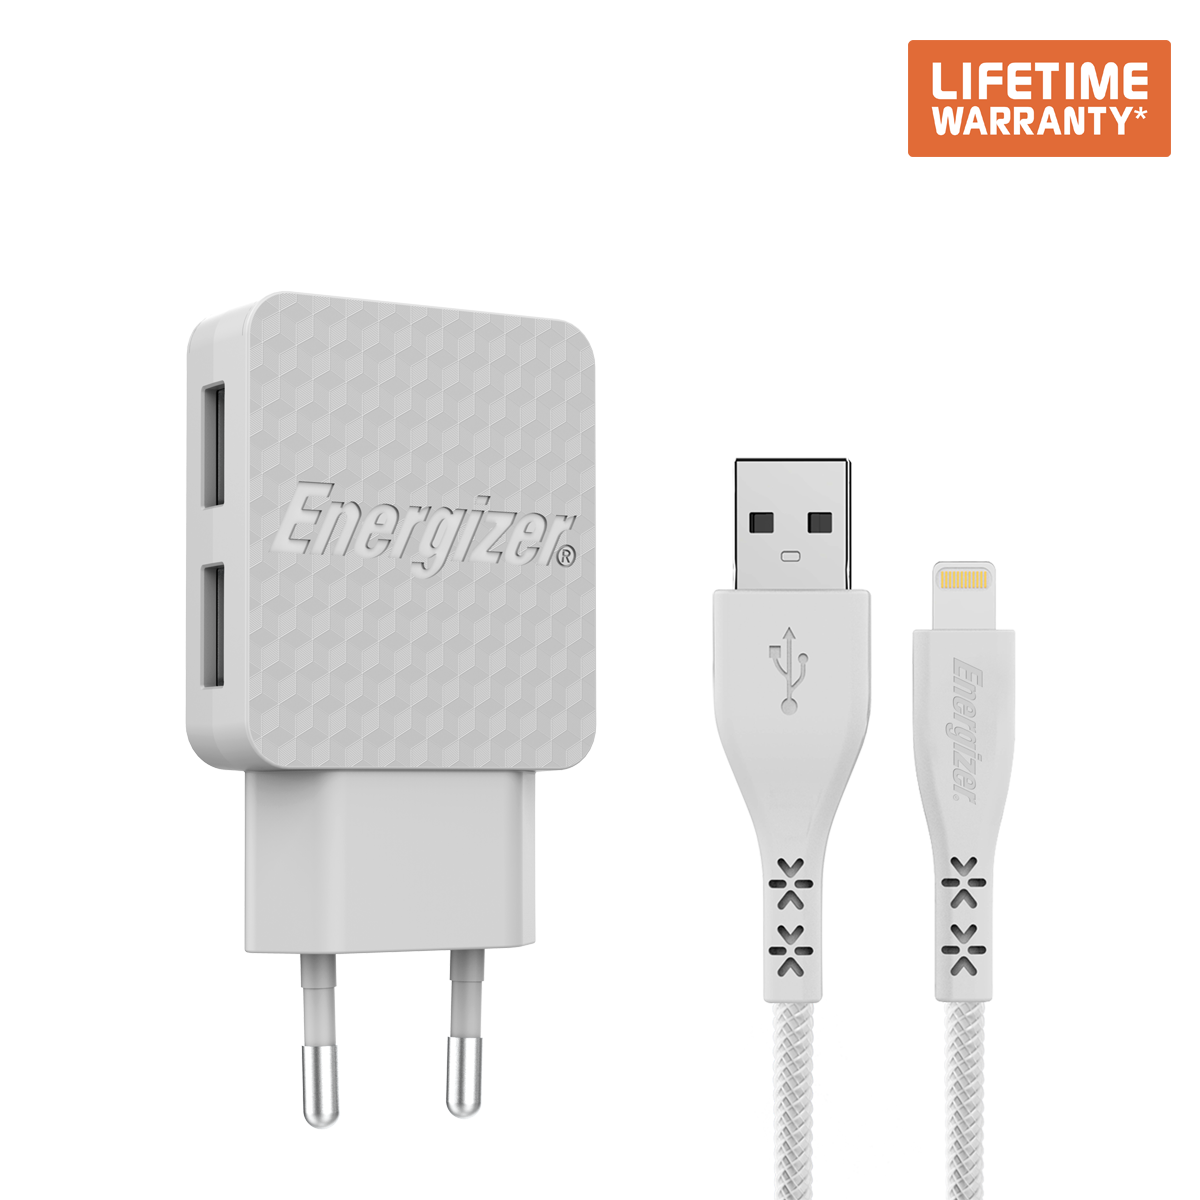 Sạc Energizer Lifetime warranty 3.4A 2USB kèm cáp Lightning-AC2CEULLIM